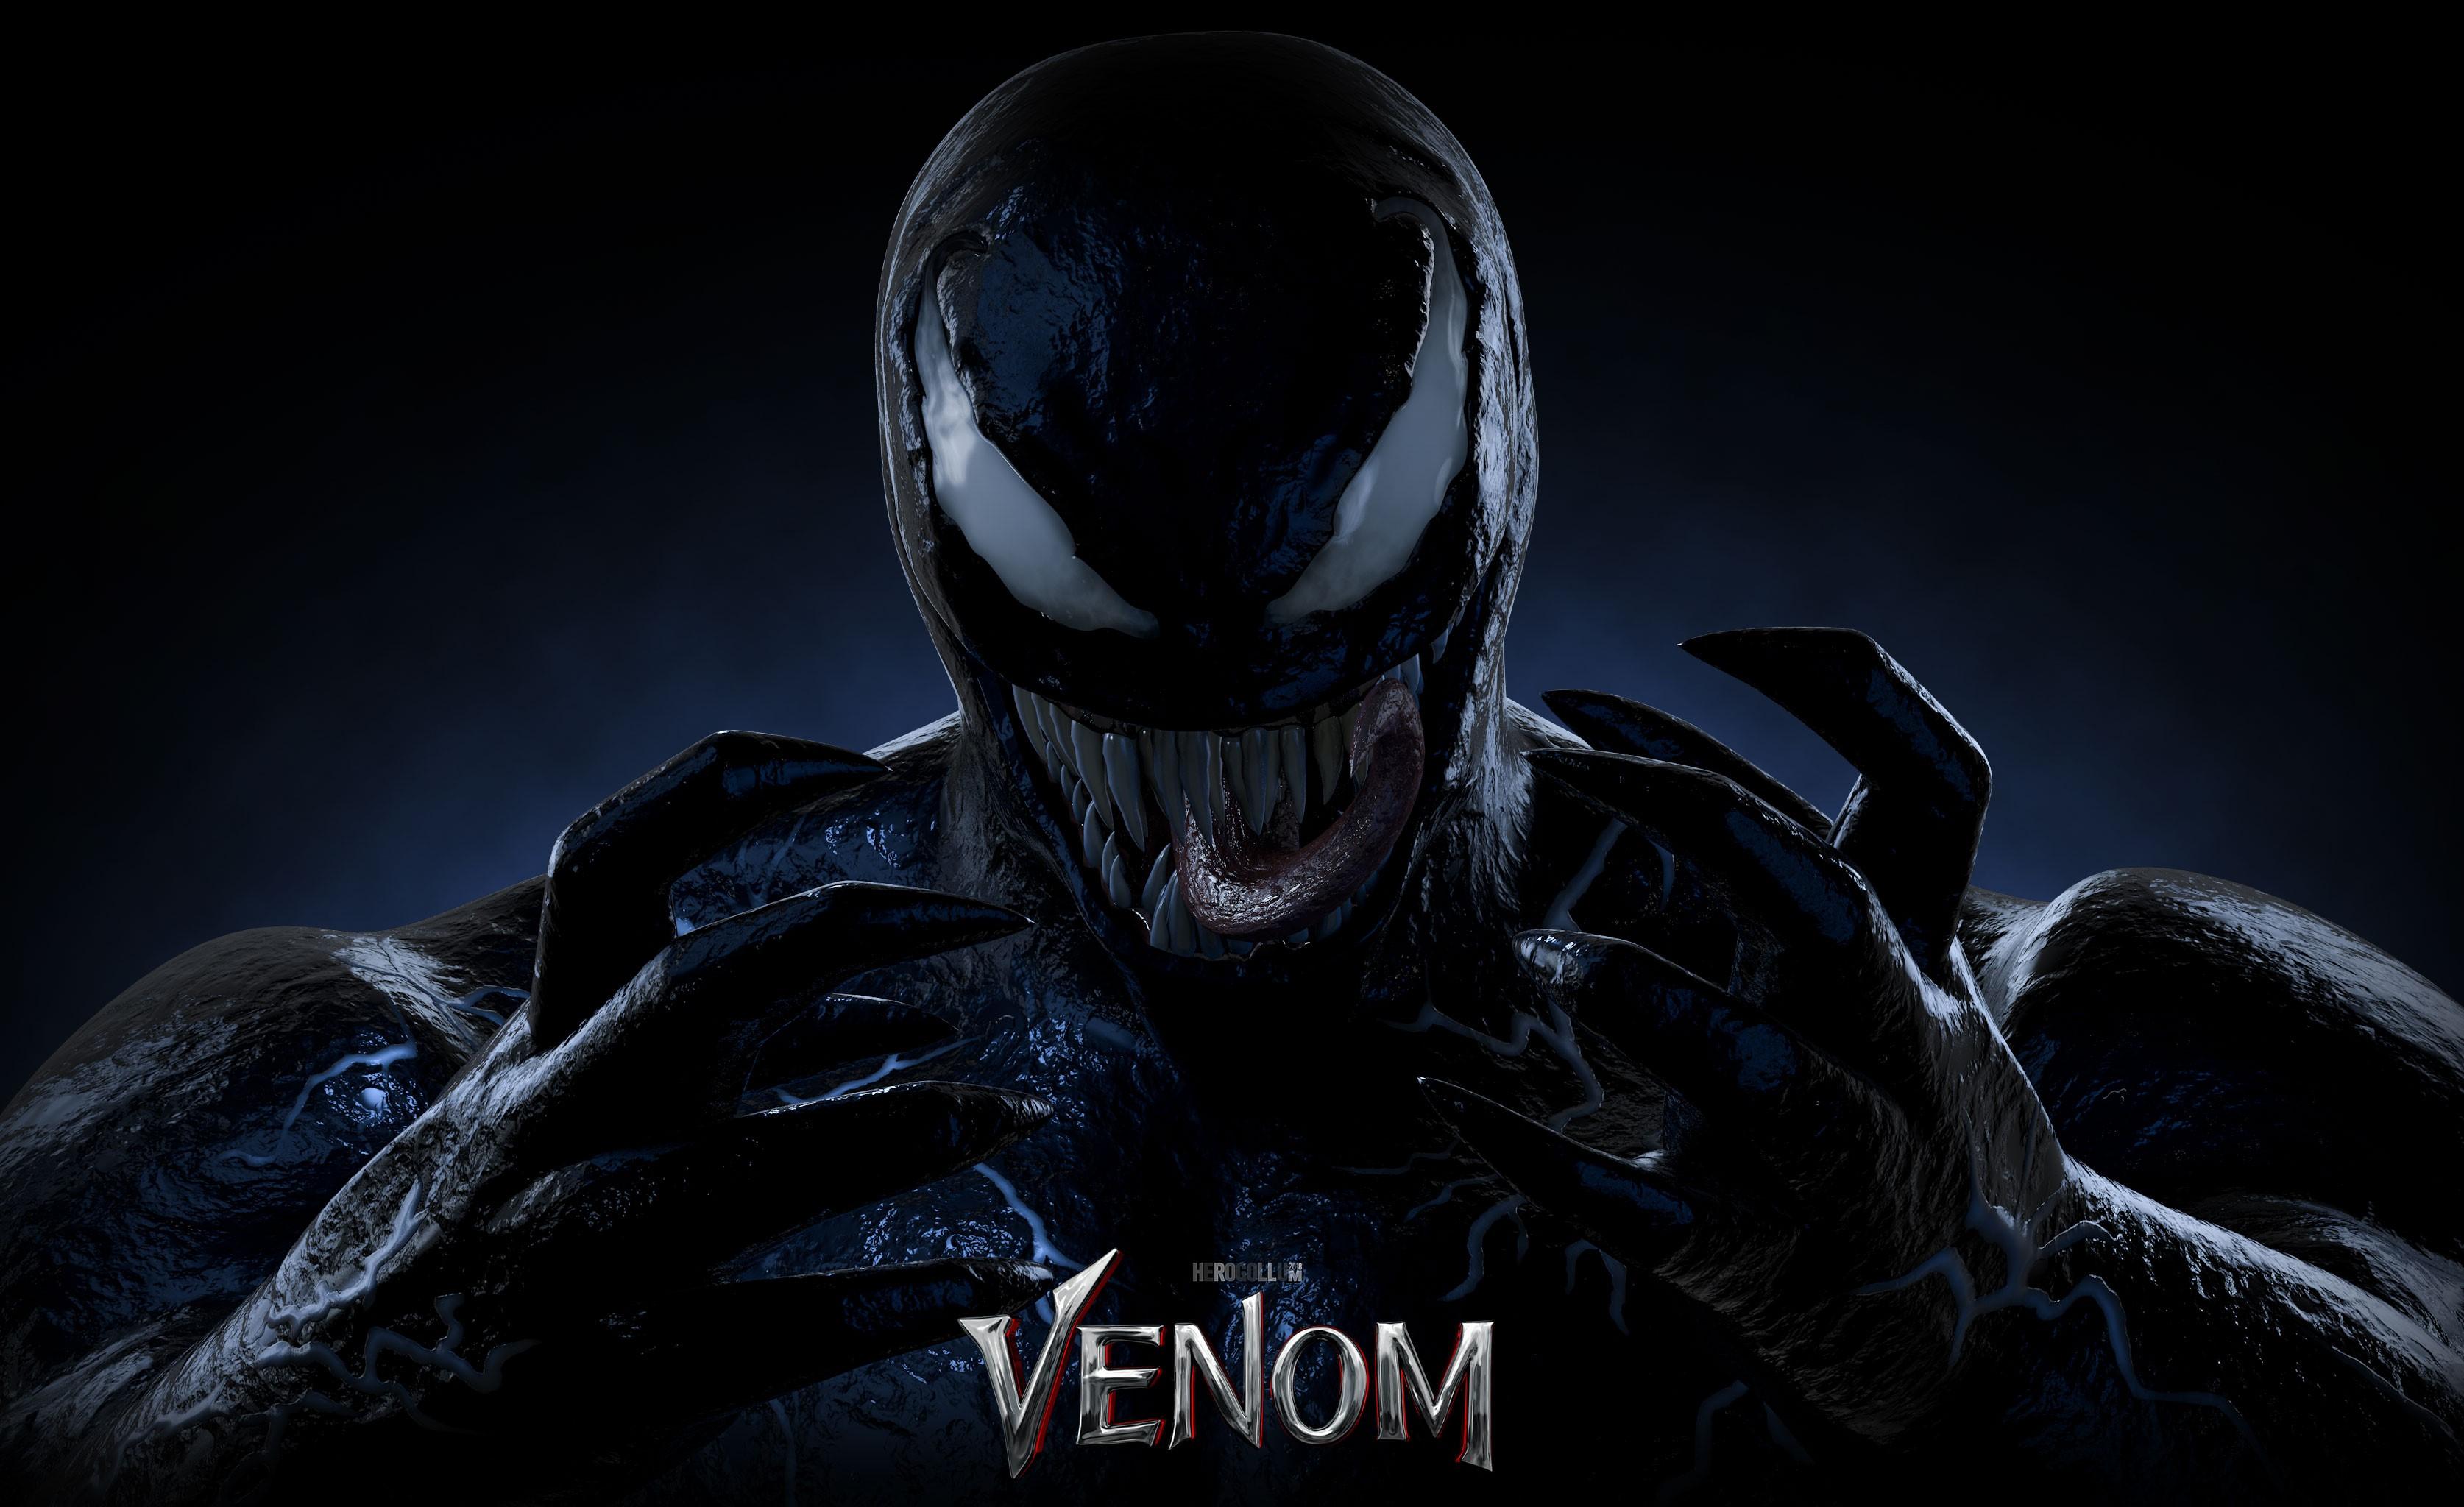 Venom hd poster